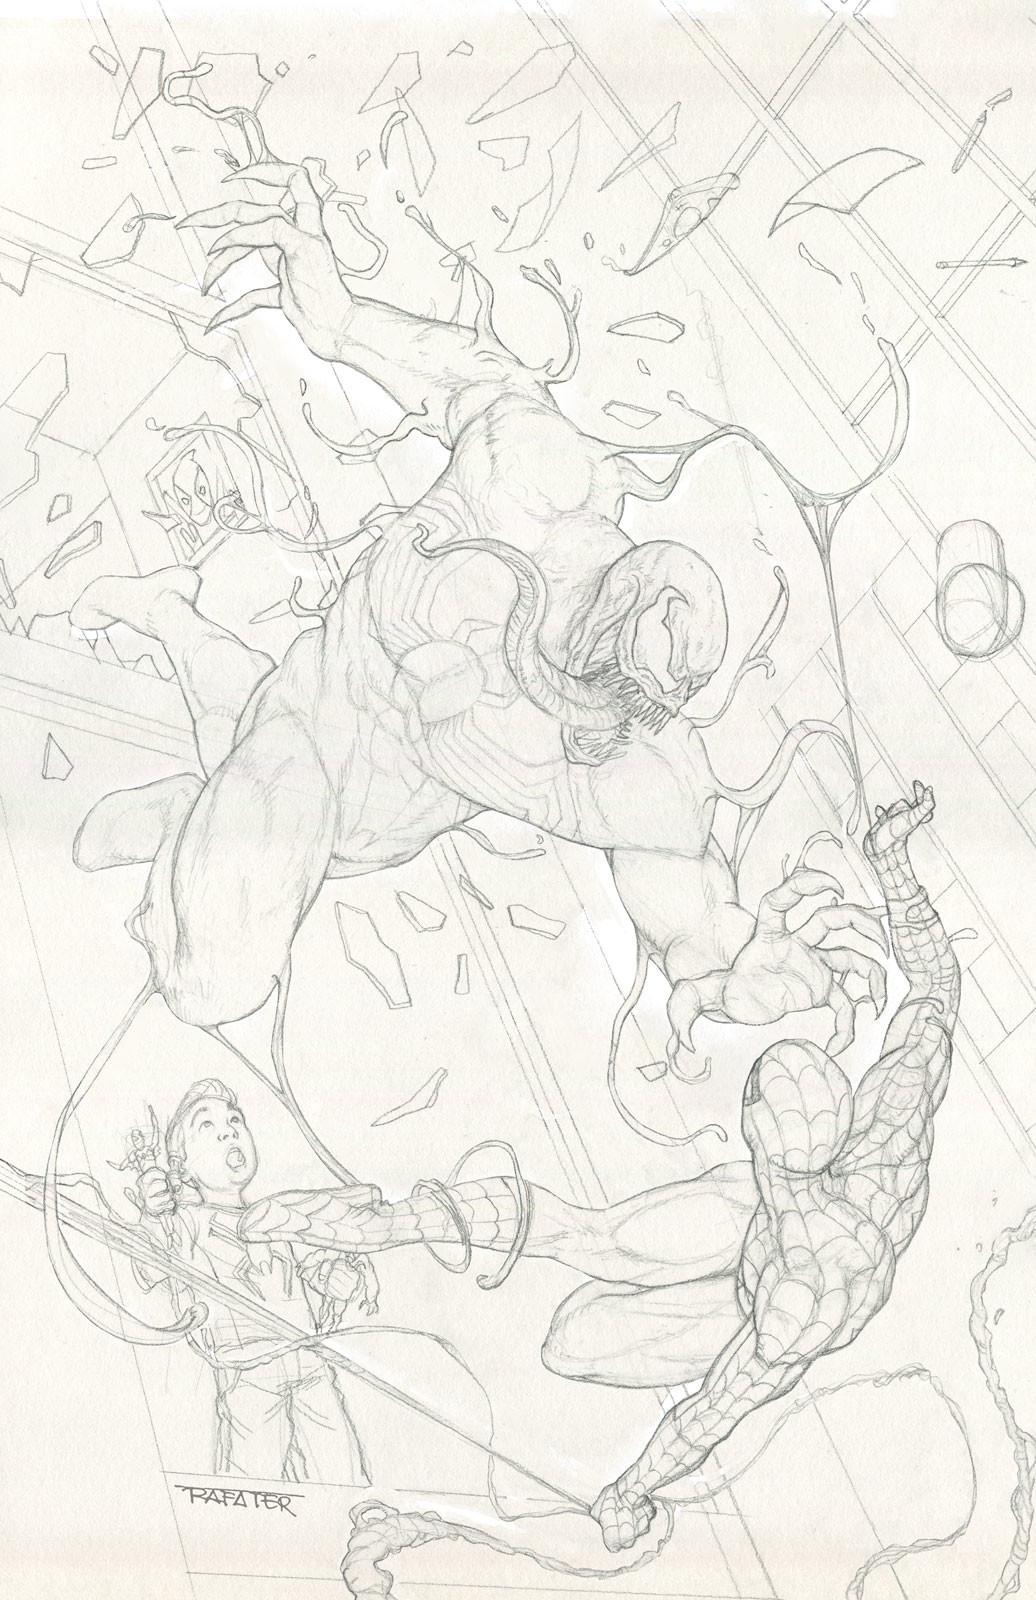 Rafael teruel rafater venom vs spiderman pencil drawing